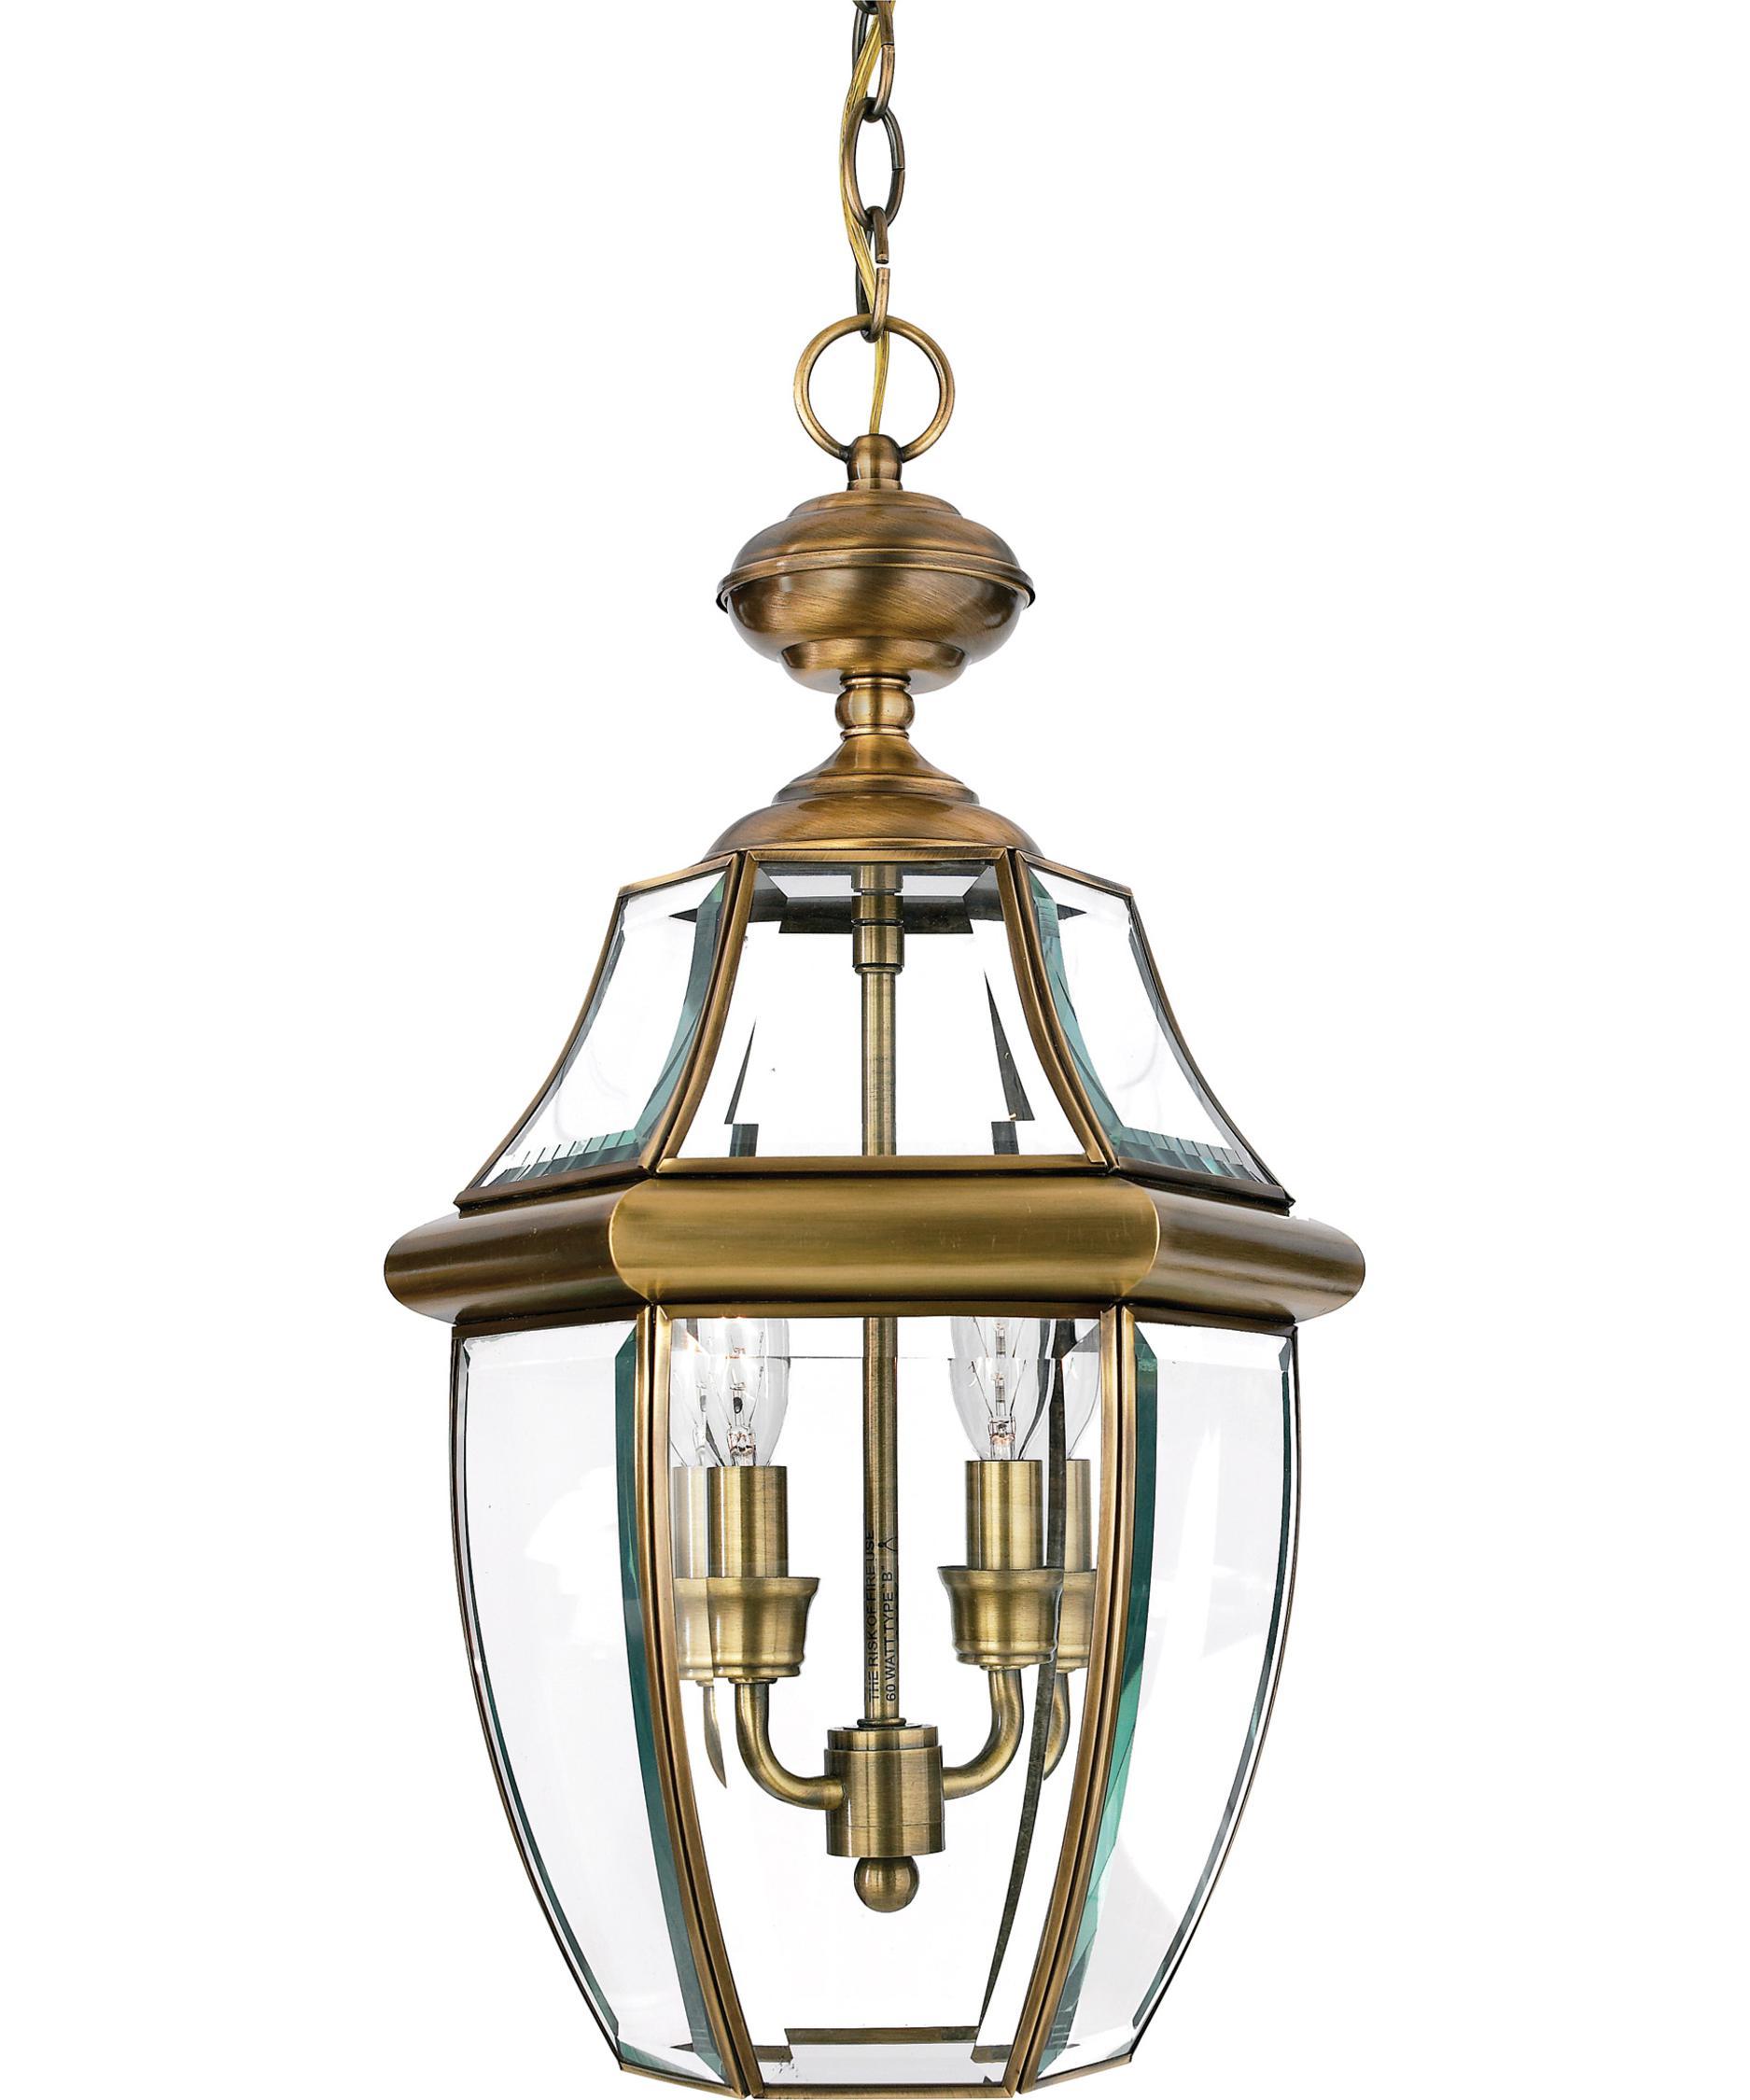 quoizel ny1178 newbury 10 inch wide 2 light outdoor hanging lantern capitol lighting